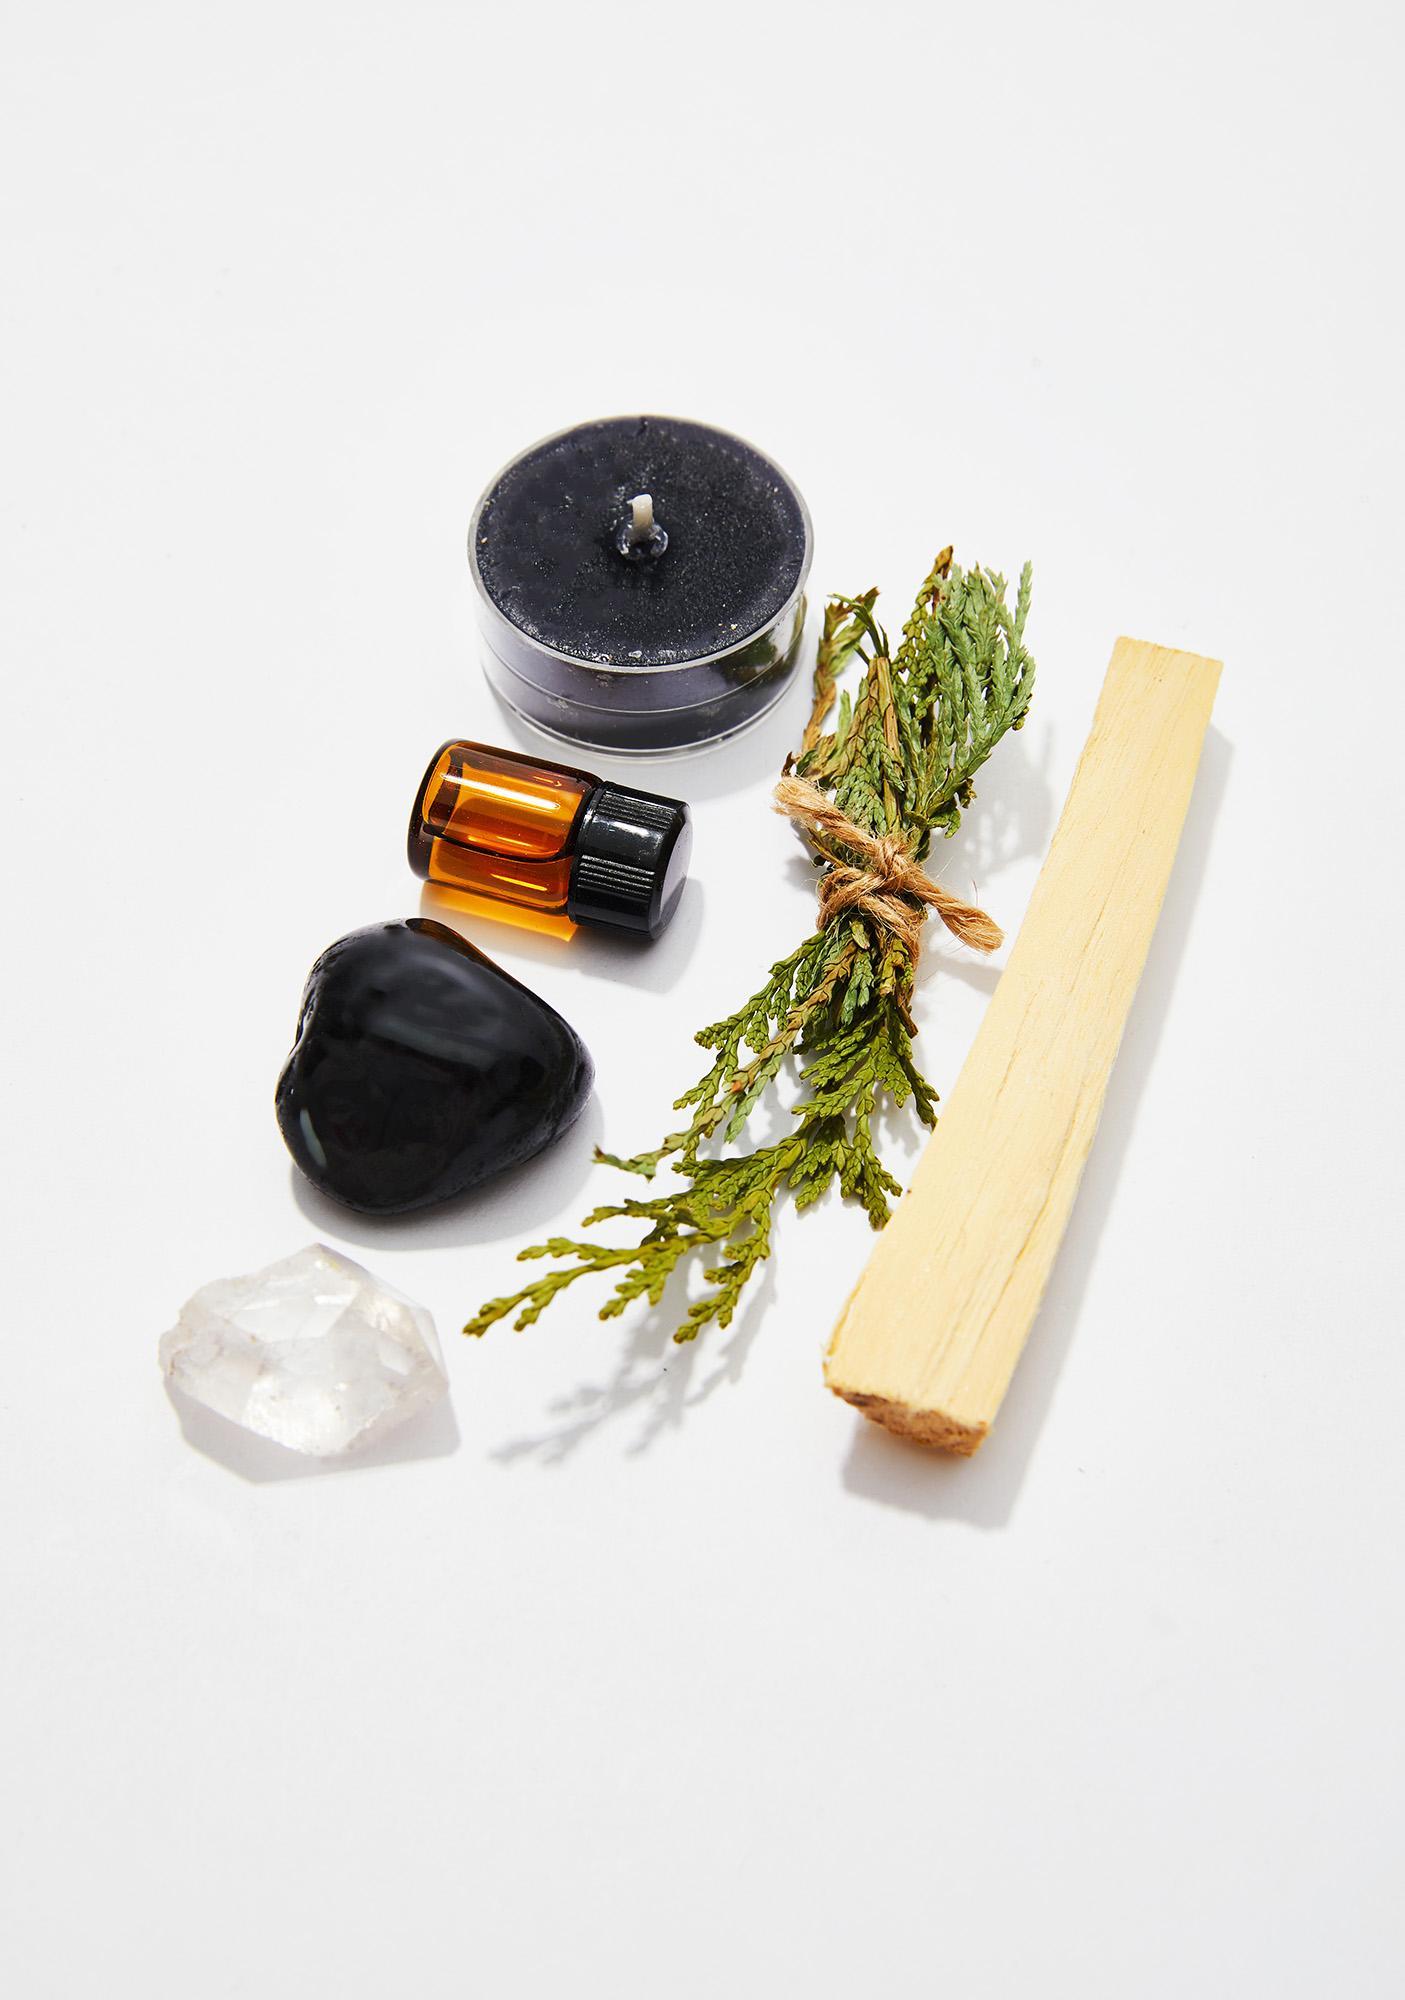 J. SOUTHERN STUDIO Protection Ritual Kit